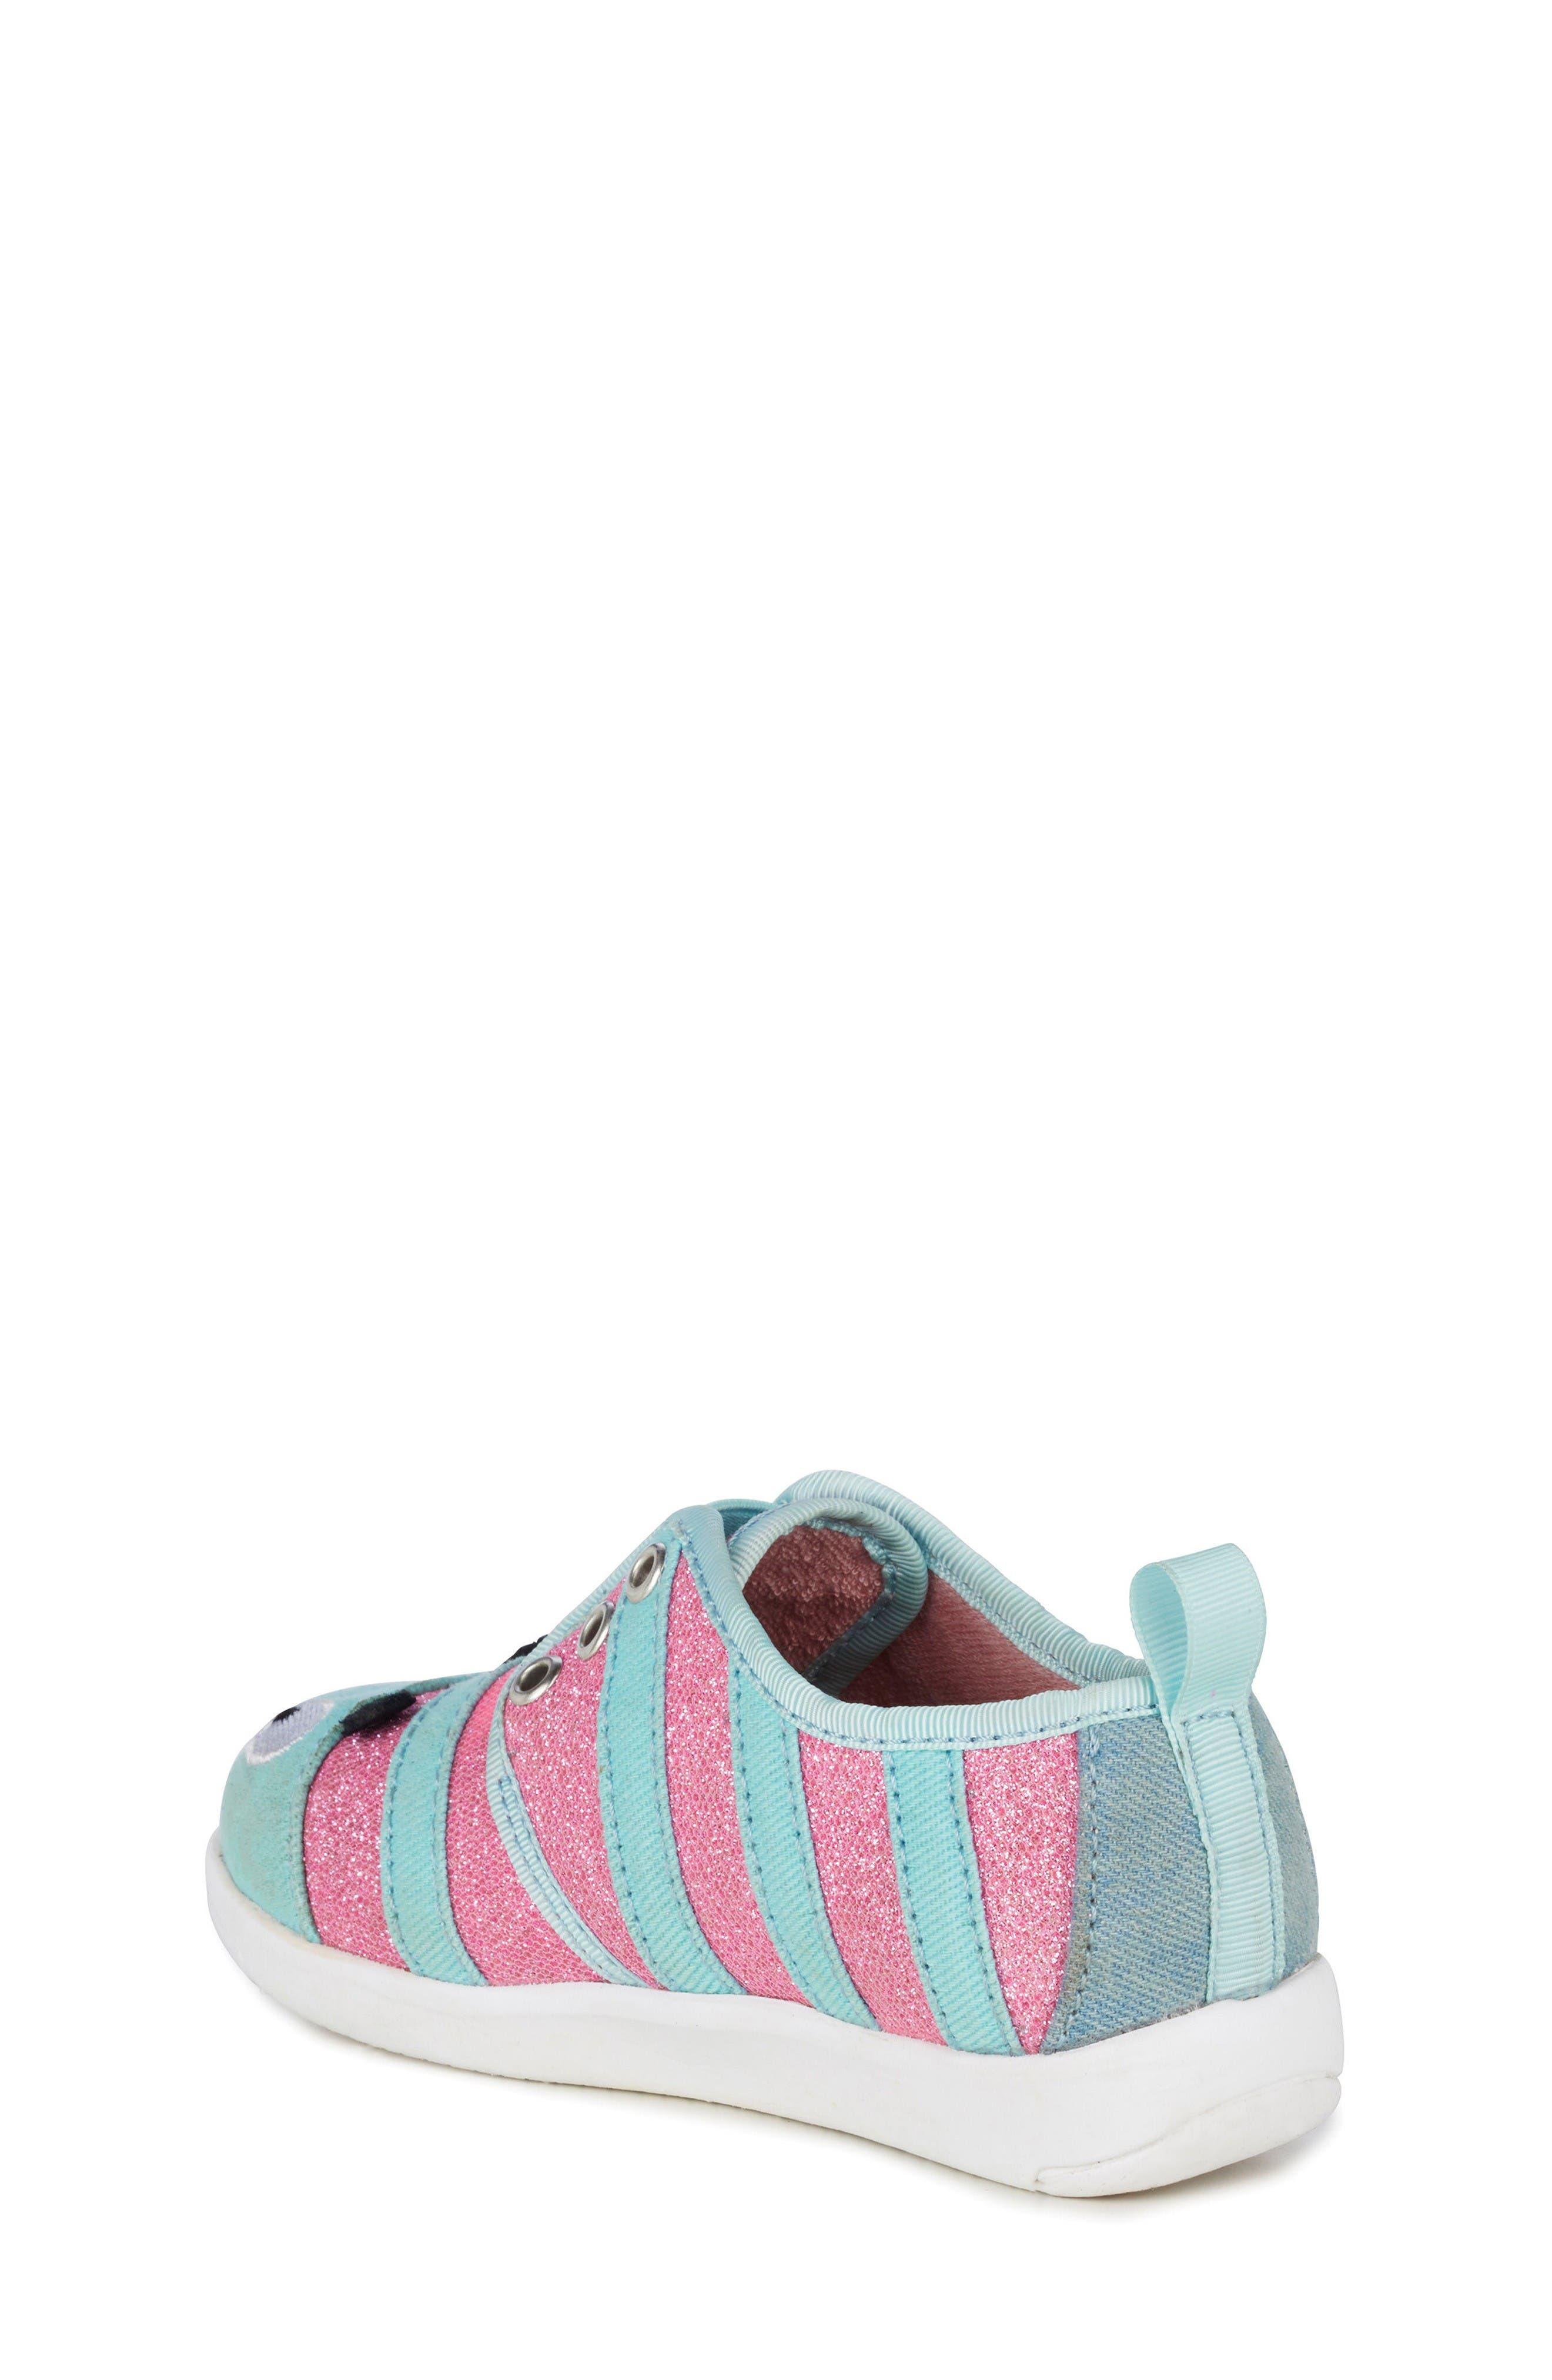 Alternate Image 2  - EMU Australia Caterpillar Laceless Sneaker (Toddler, Little Kid & Big Kid)